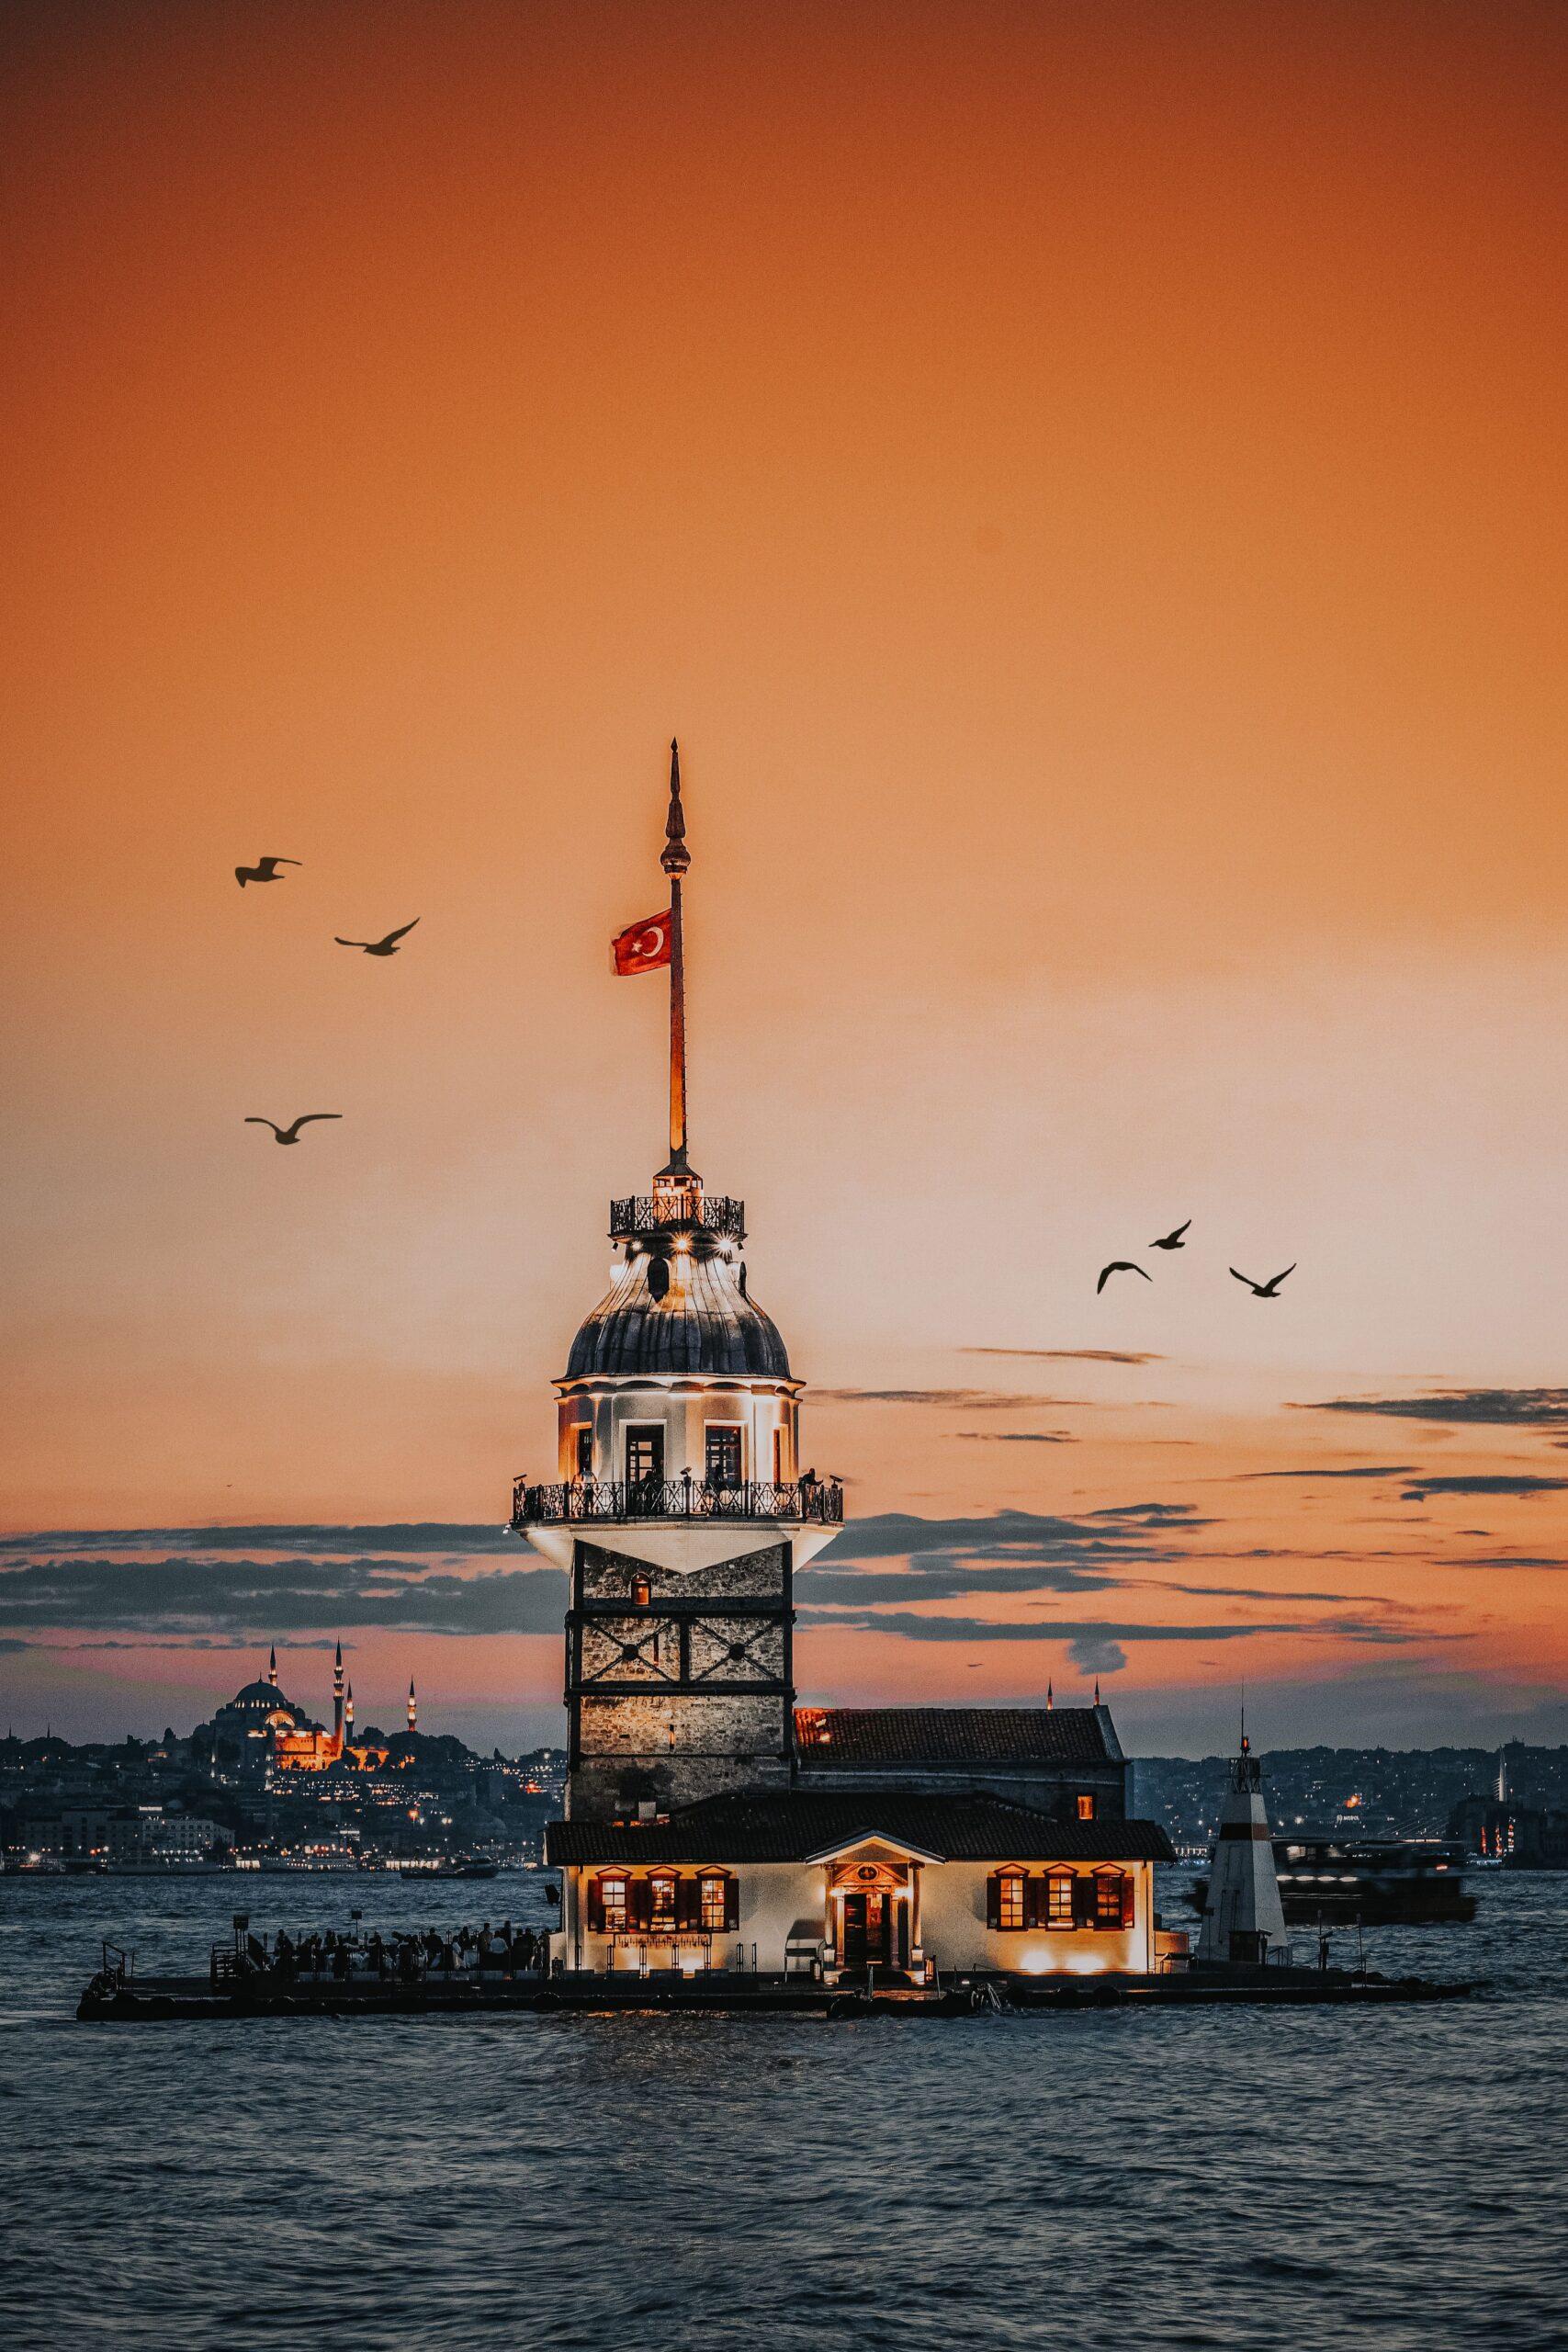 https://www.tourbulance.com.tr/wp-content/uploads/2021/03/Istanbul5-scaled.jpg